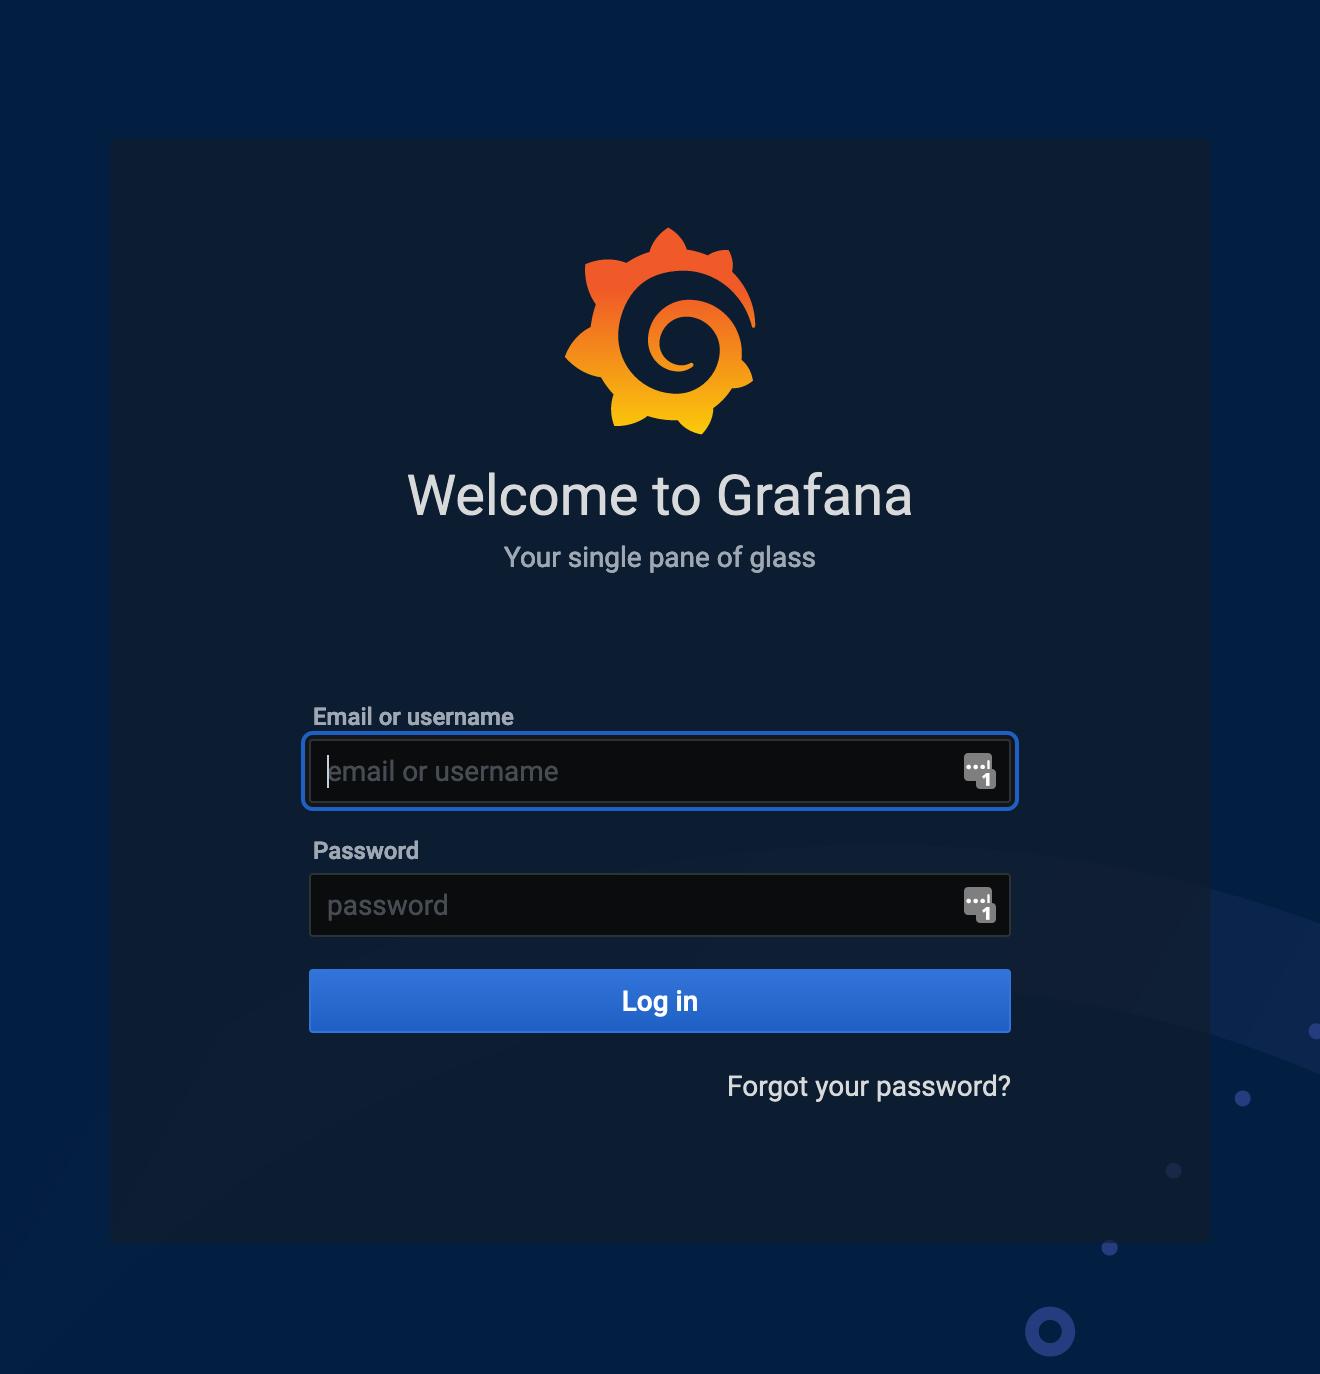 Log in to Grafana